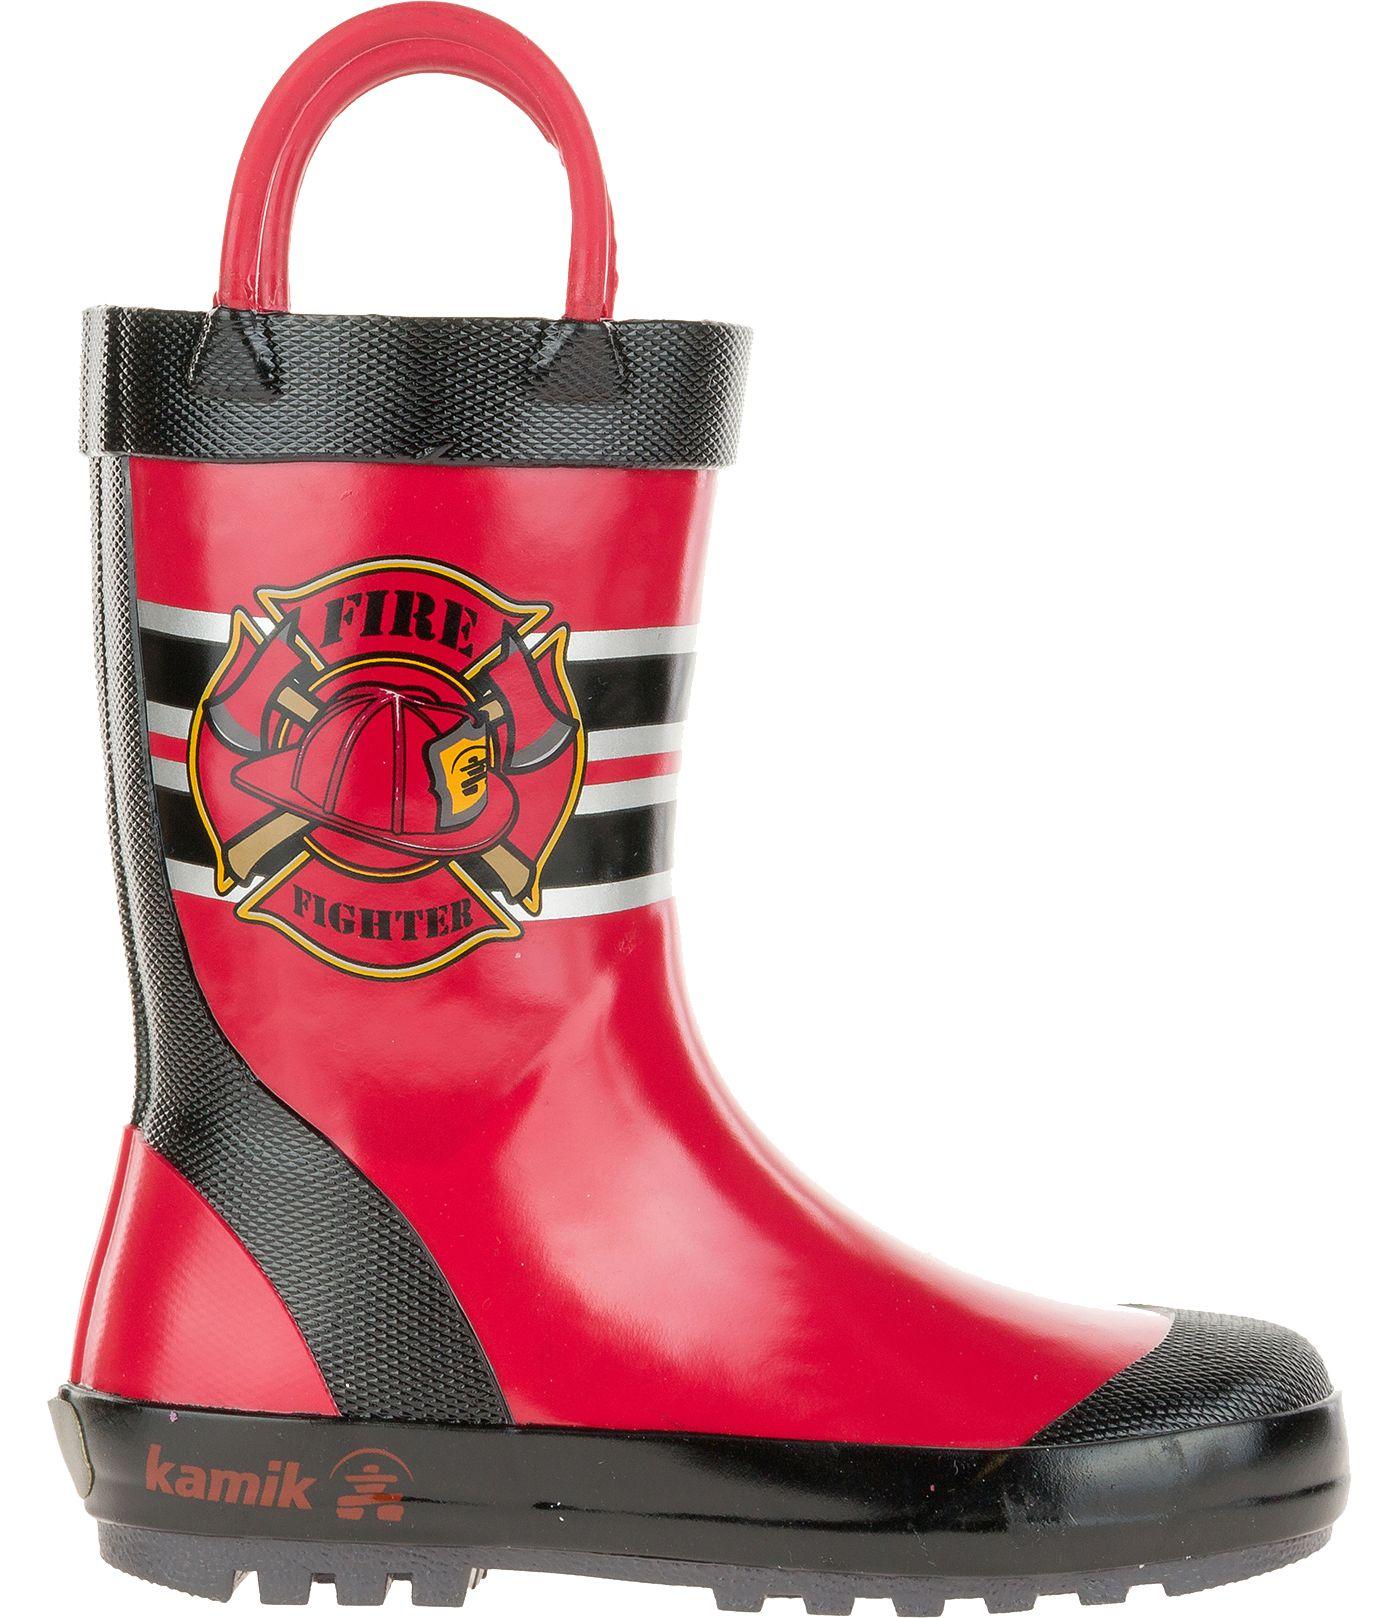 Kamik Toddler Fireman Rain Boots